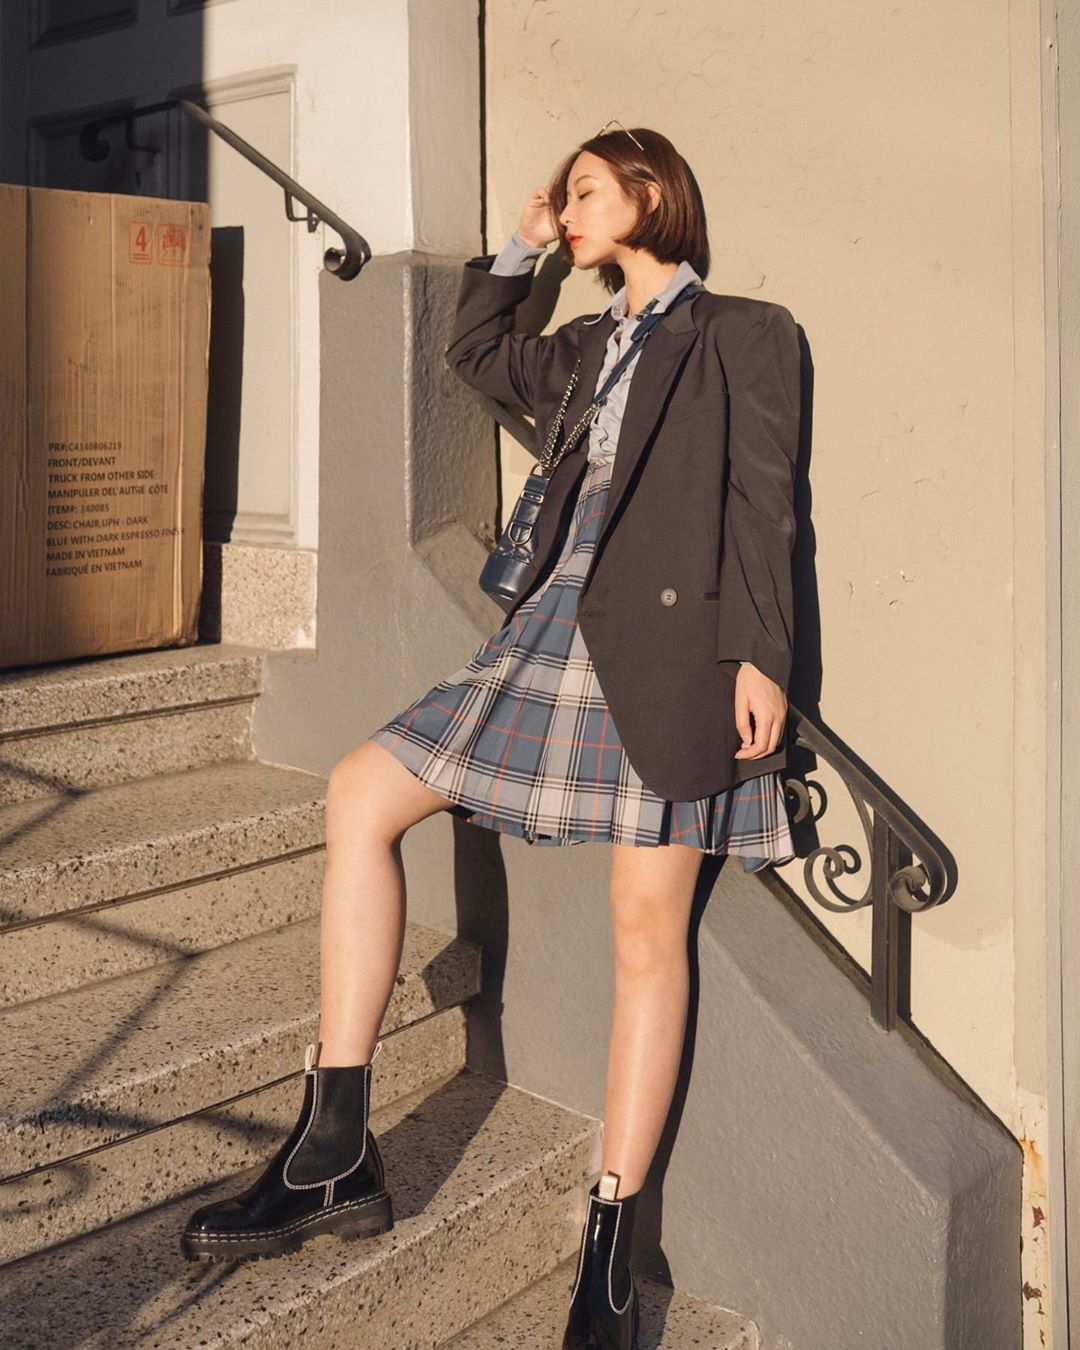 giày boots cao cổ vintage aesthetic đầm kẻ caro áo blazer